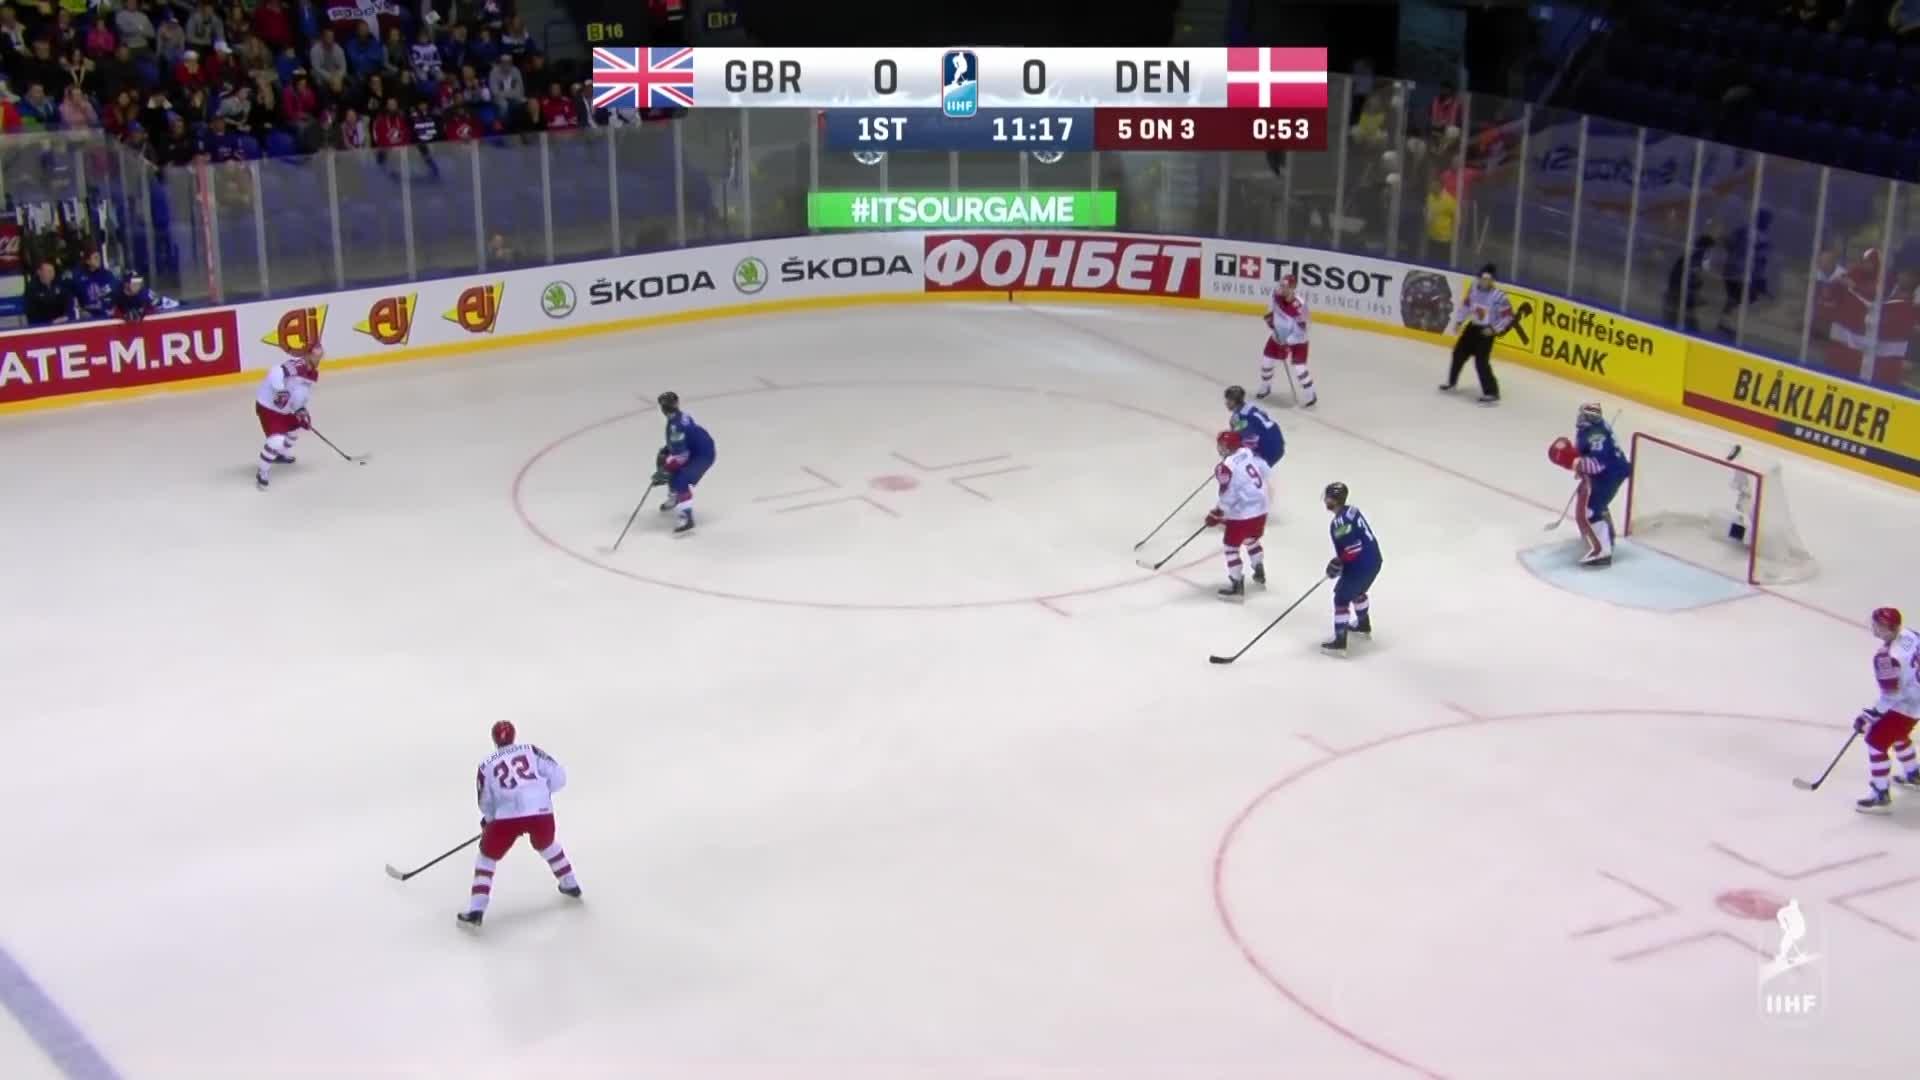 IIHF Worlds 2019, NL_ID1150280, NL_ID1150299, NL_T690G21P1S11:10, Sports, nearlive, Lars Eller assists on goal by Jesper Jensen for Team Denmark IIHF GIFs